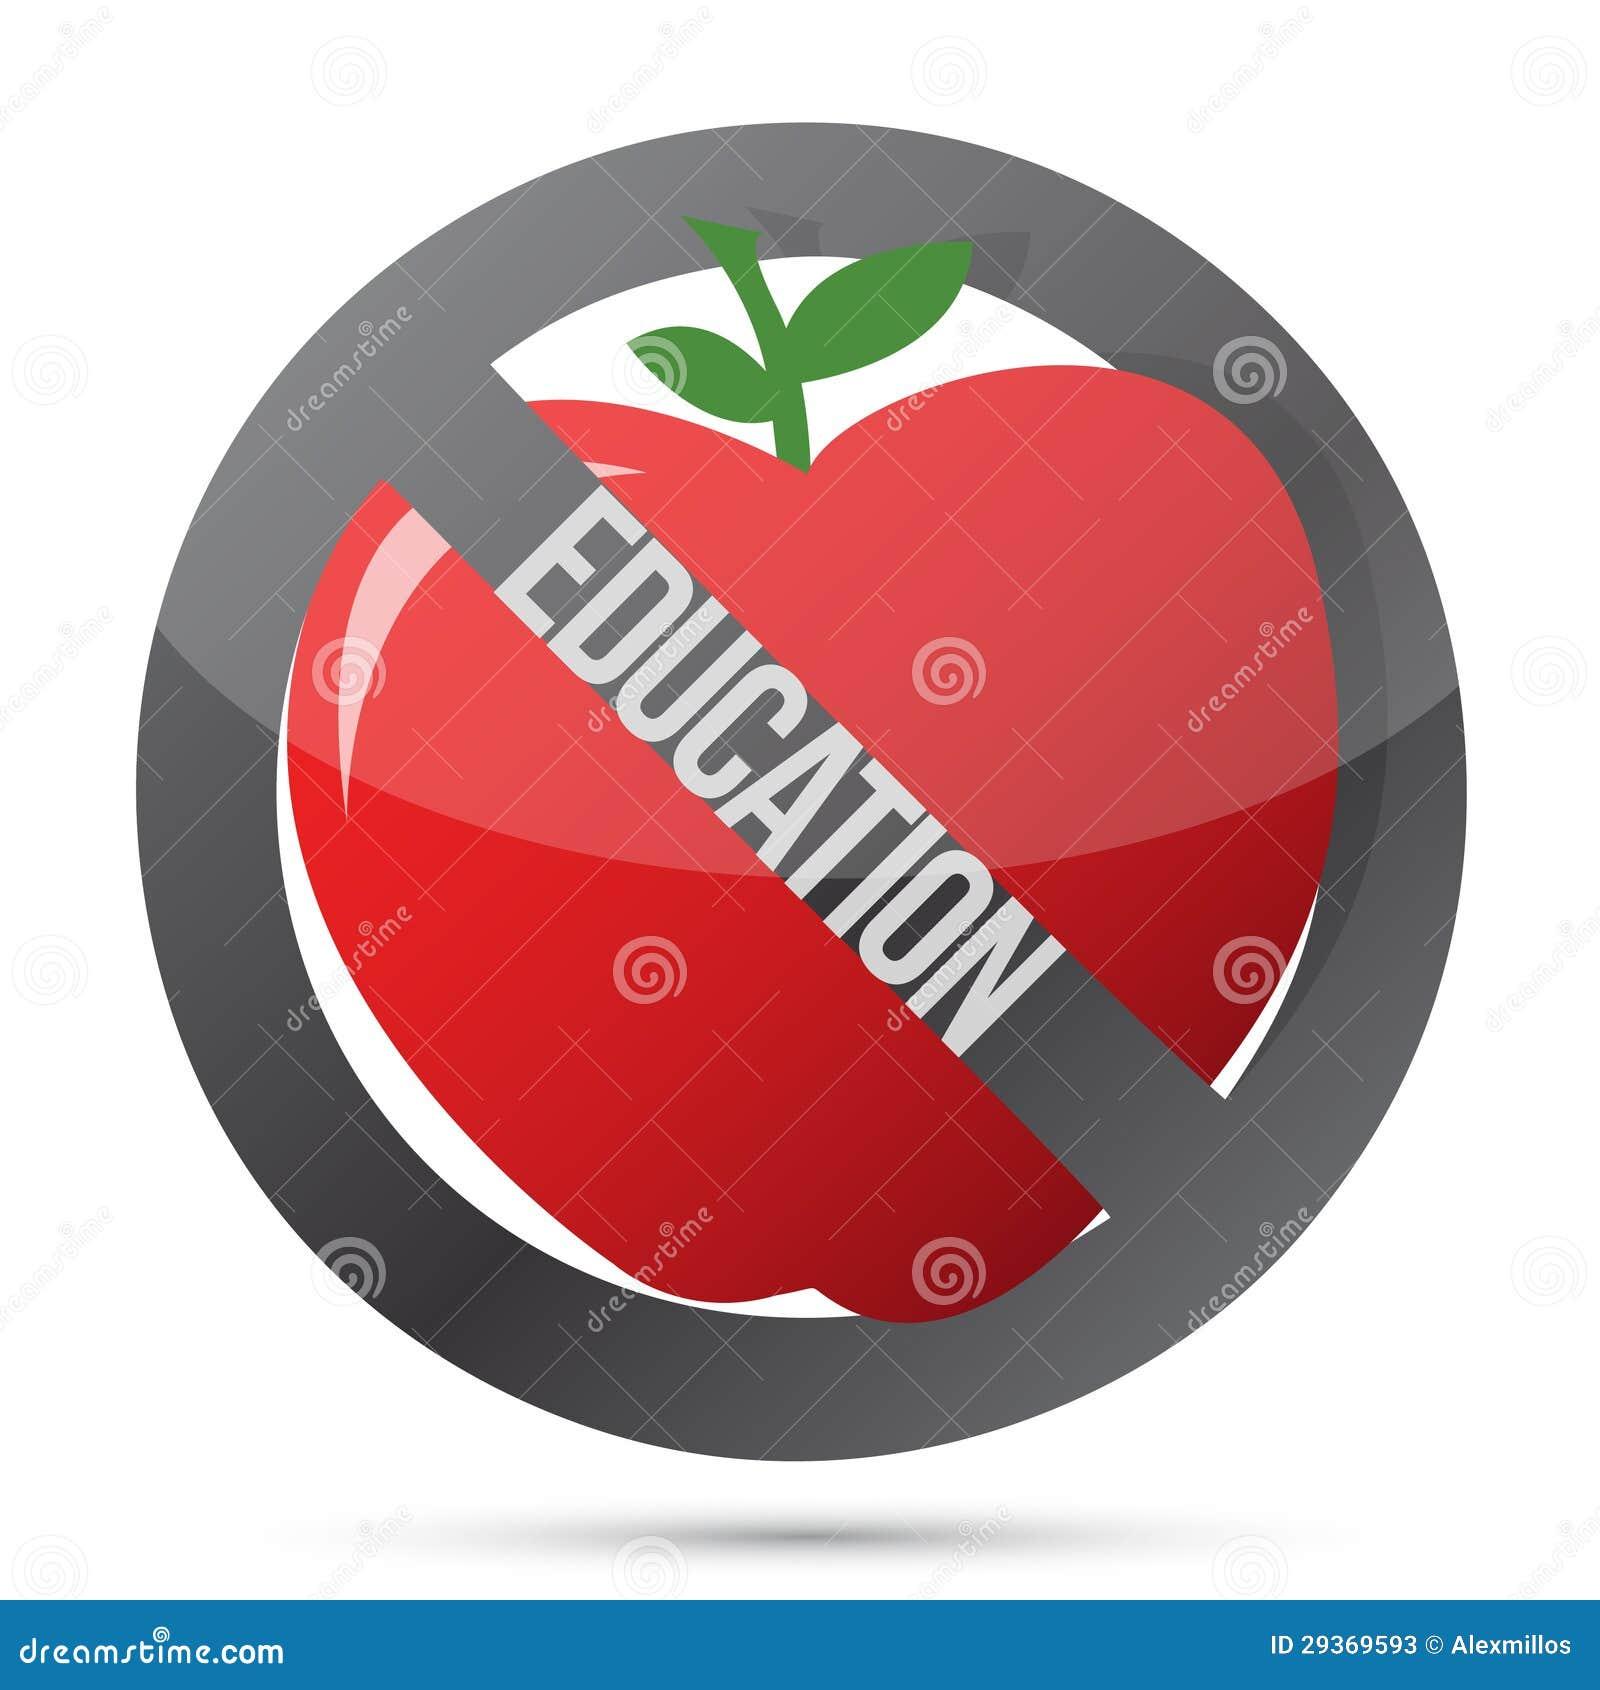 no-education-sign-symbol-29369593.jpg